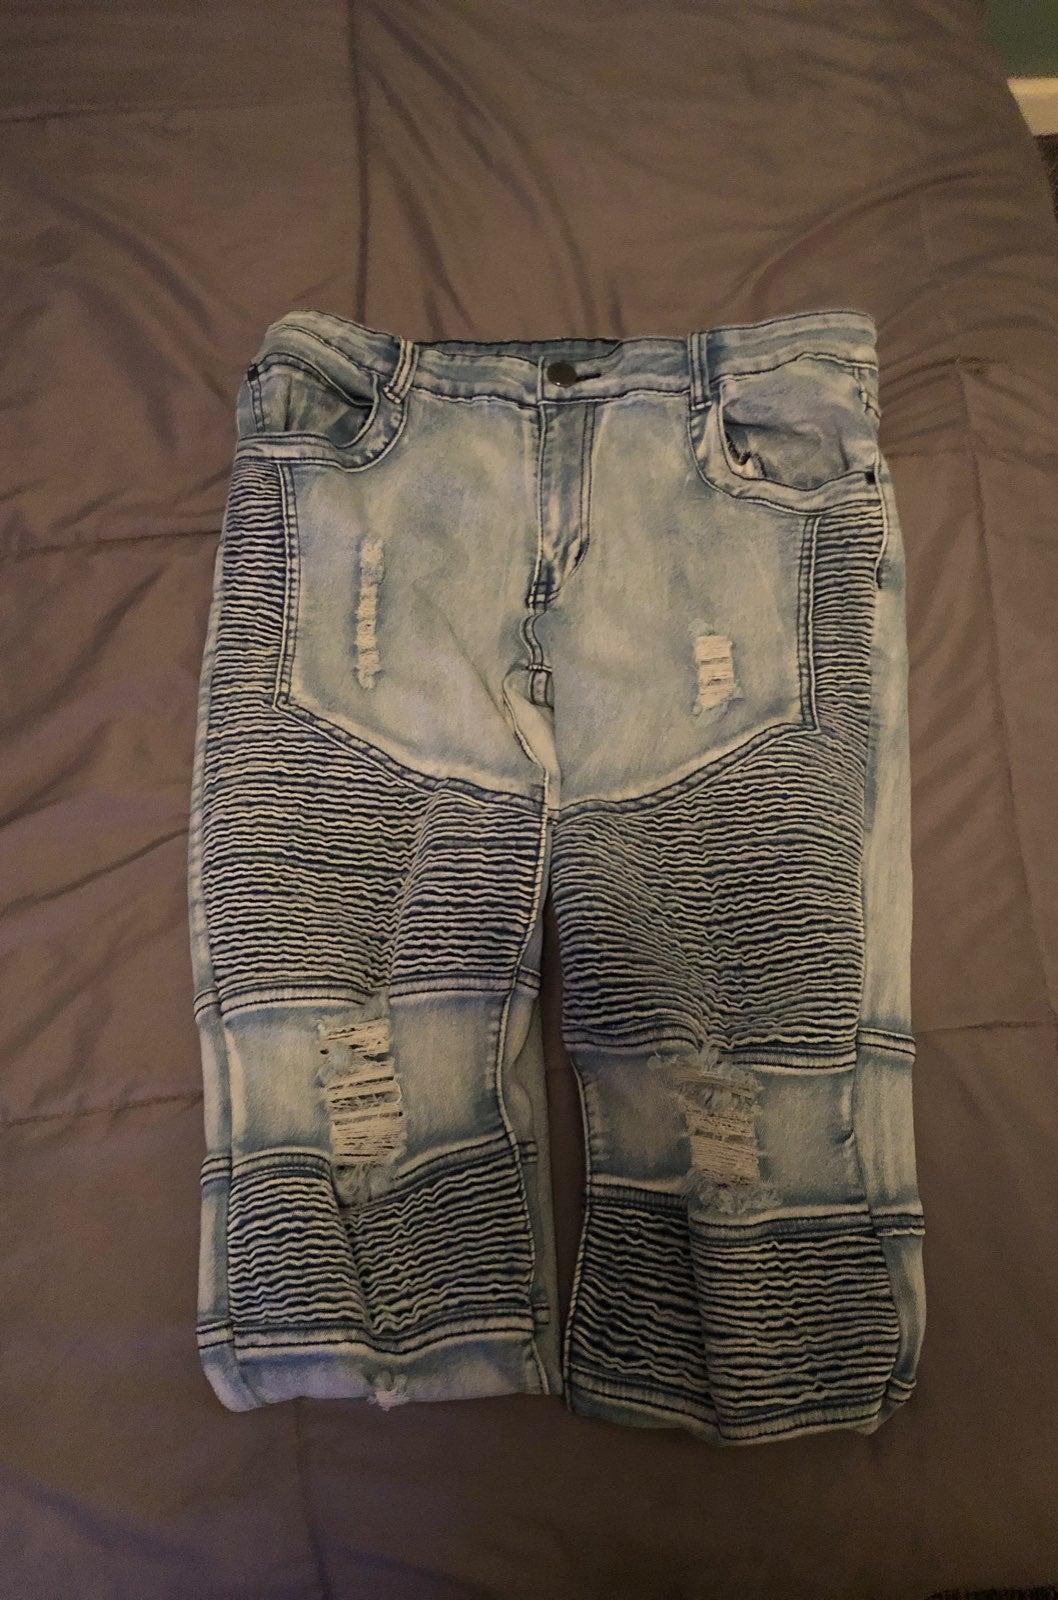 Ripped pants